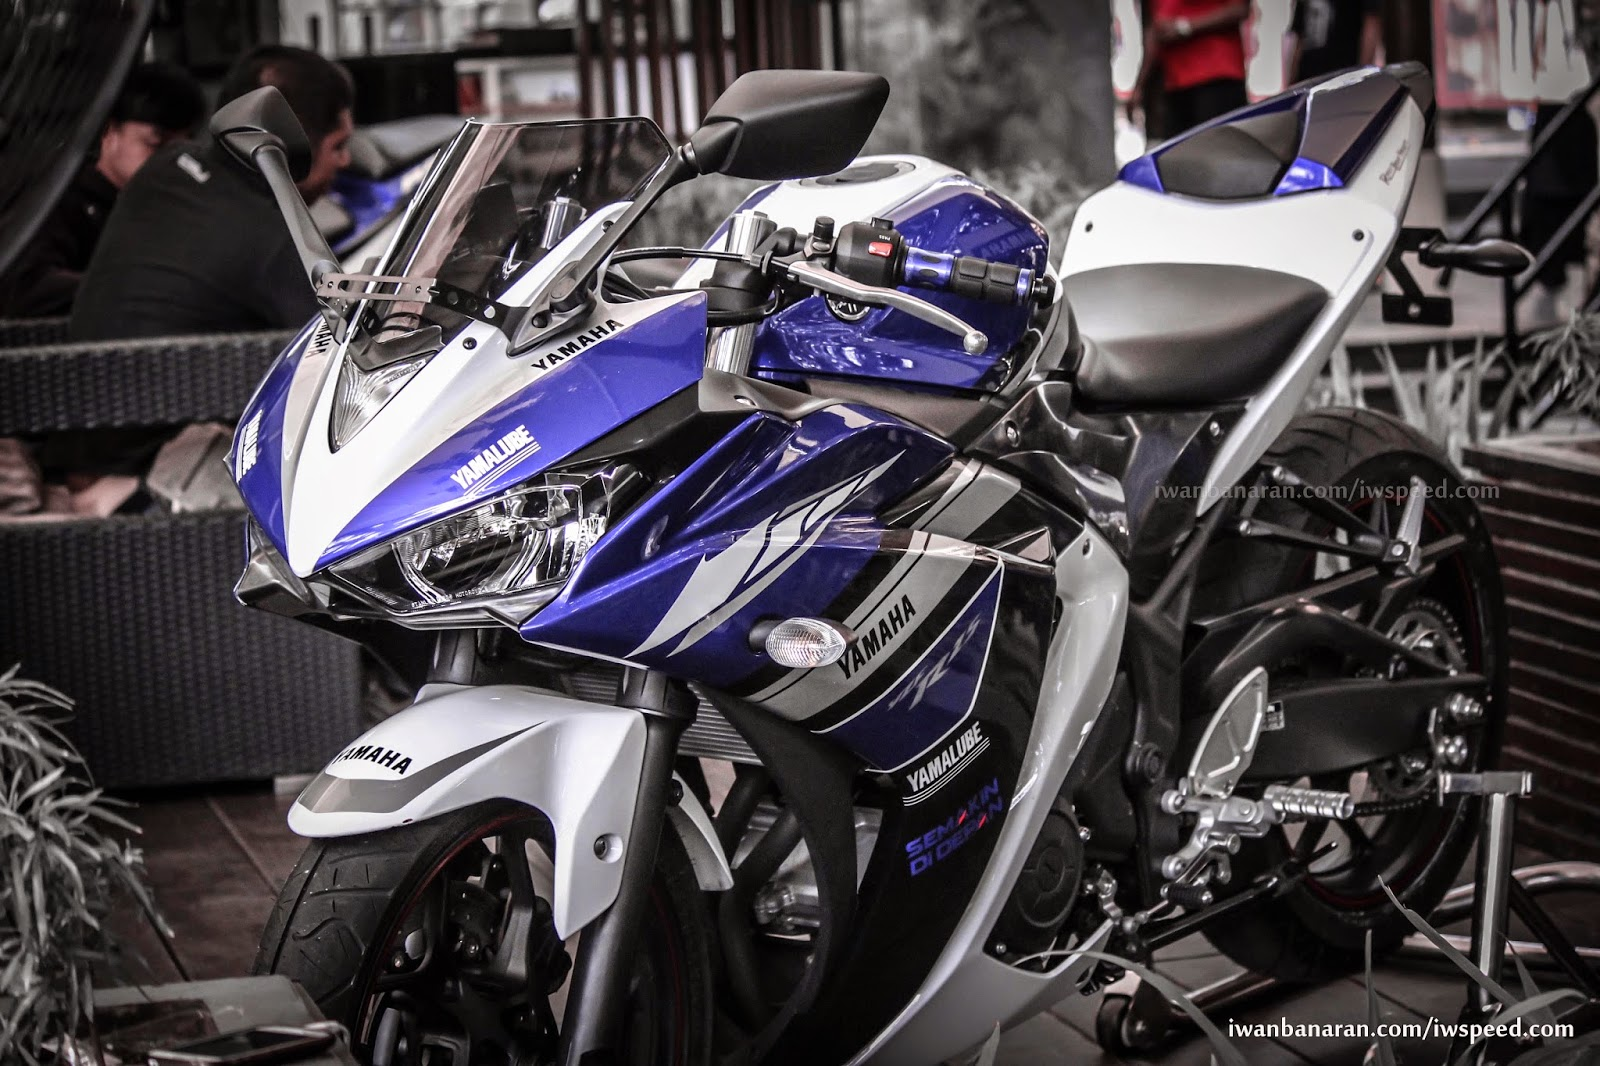 Spesifikasi Harga Yamaha R25 Terbaru